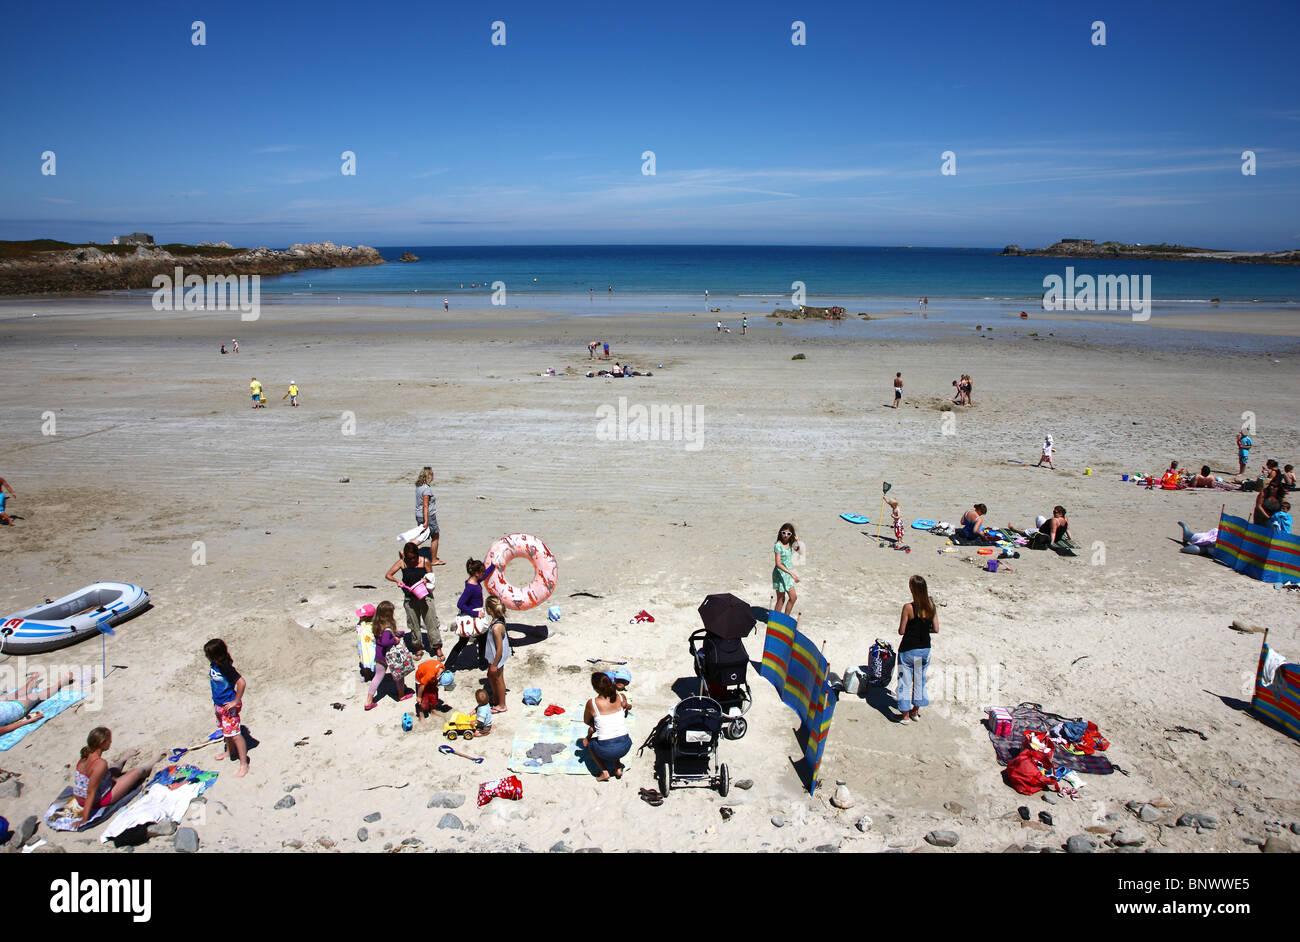 Pembroke Bay , beach, north coast, Guernsey, Channel Islands, UK, Europe, Stock Photo